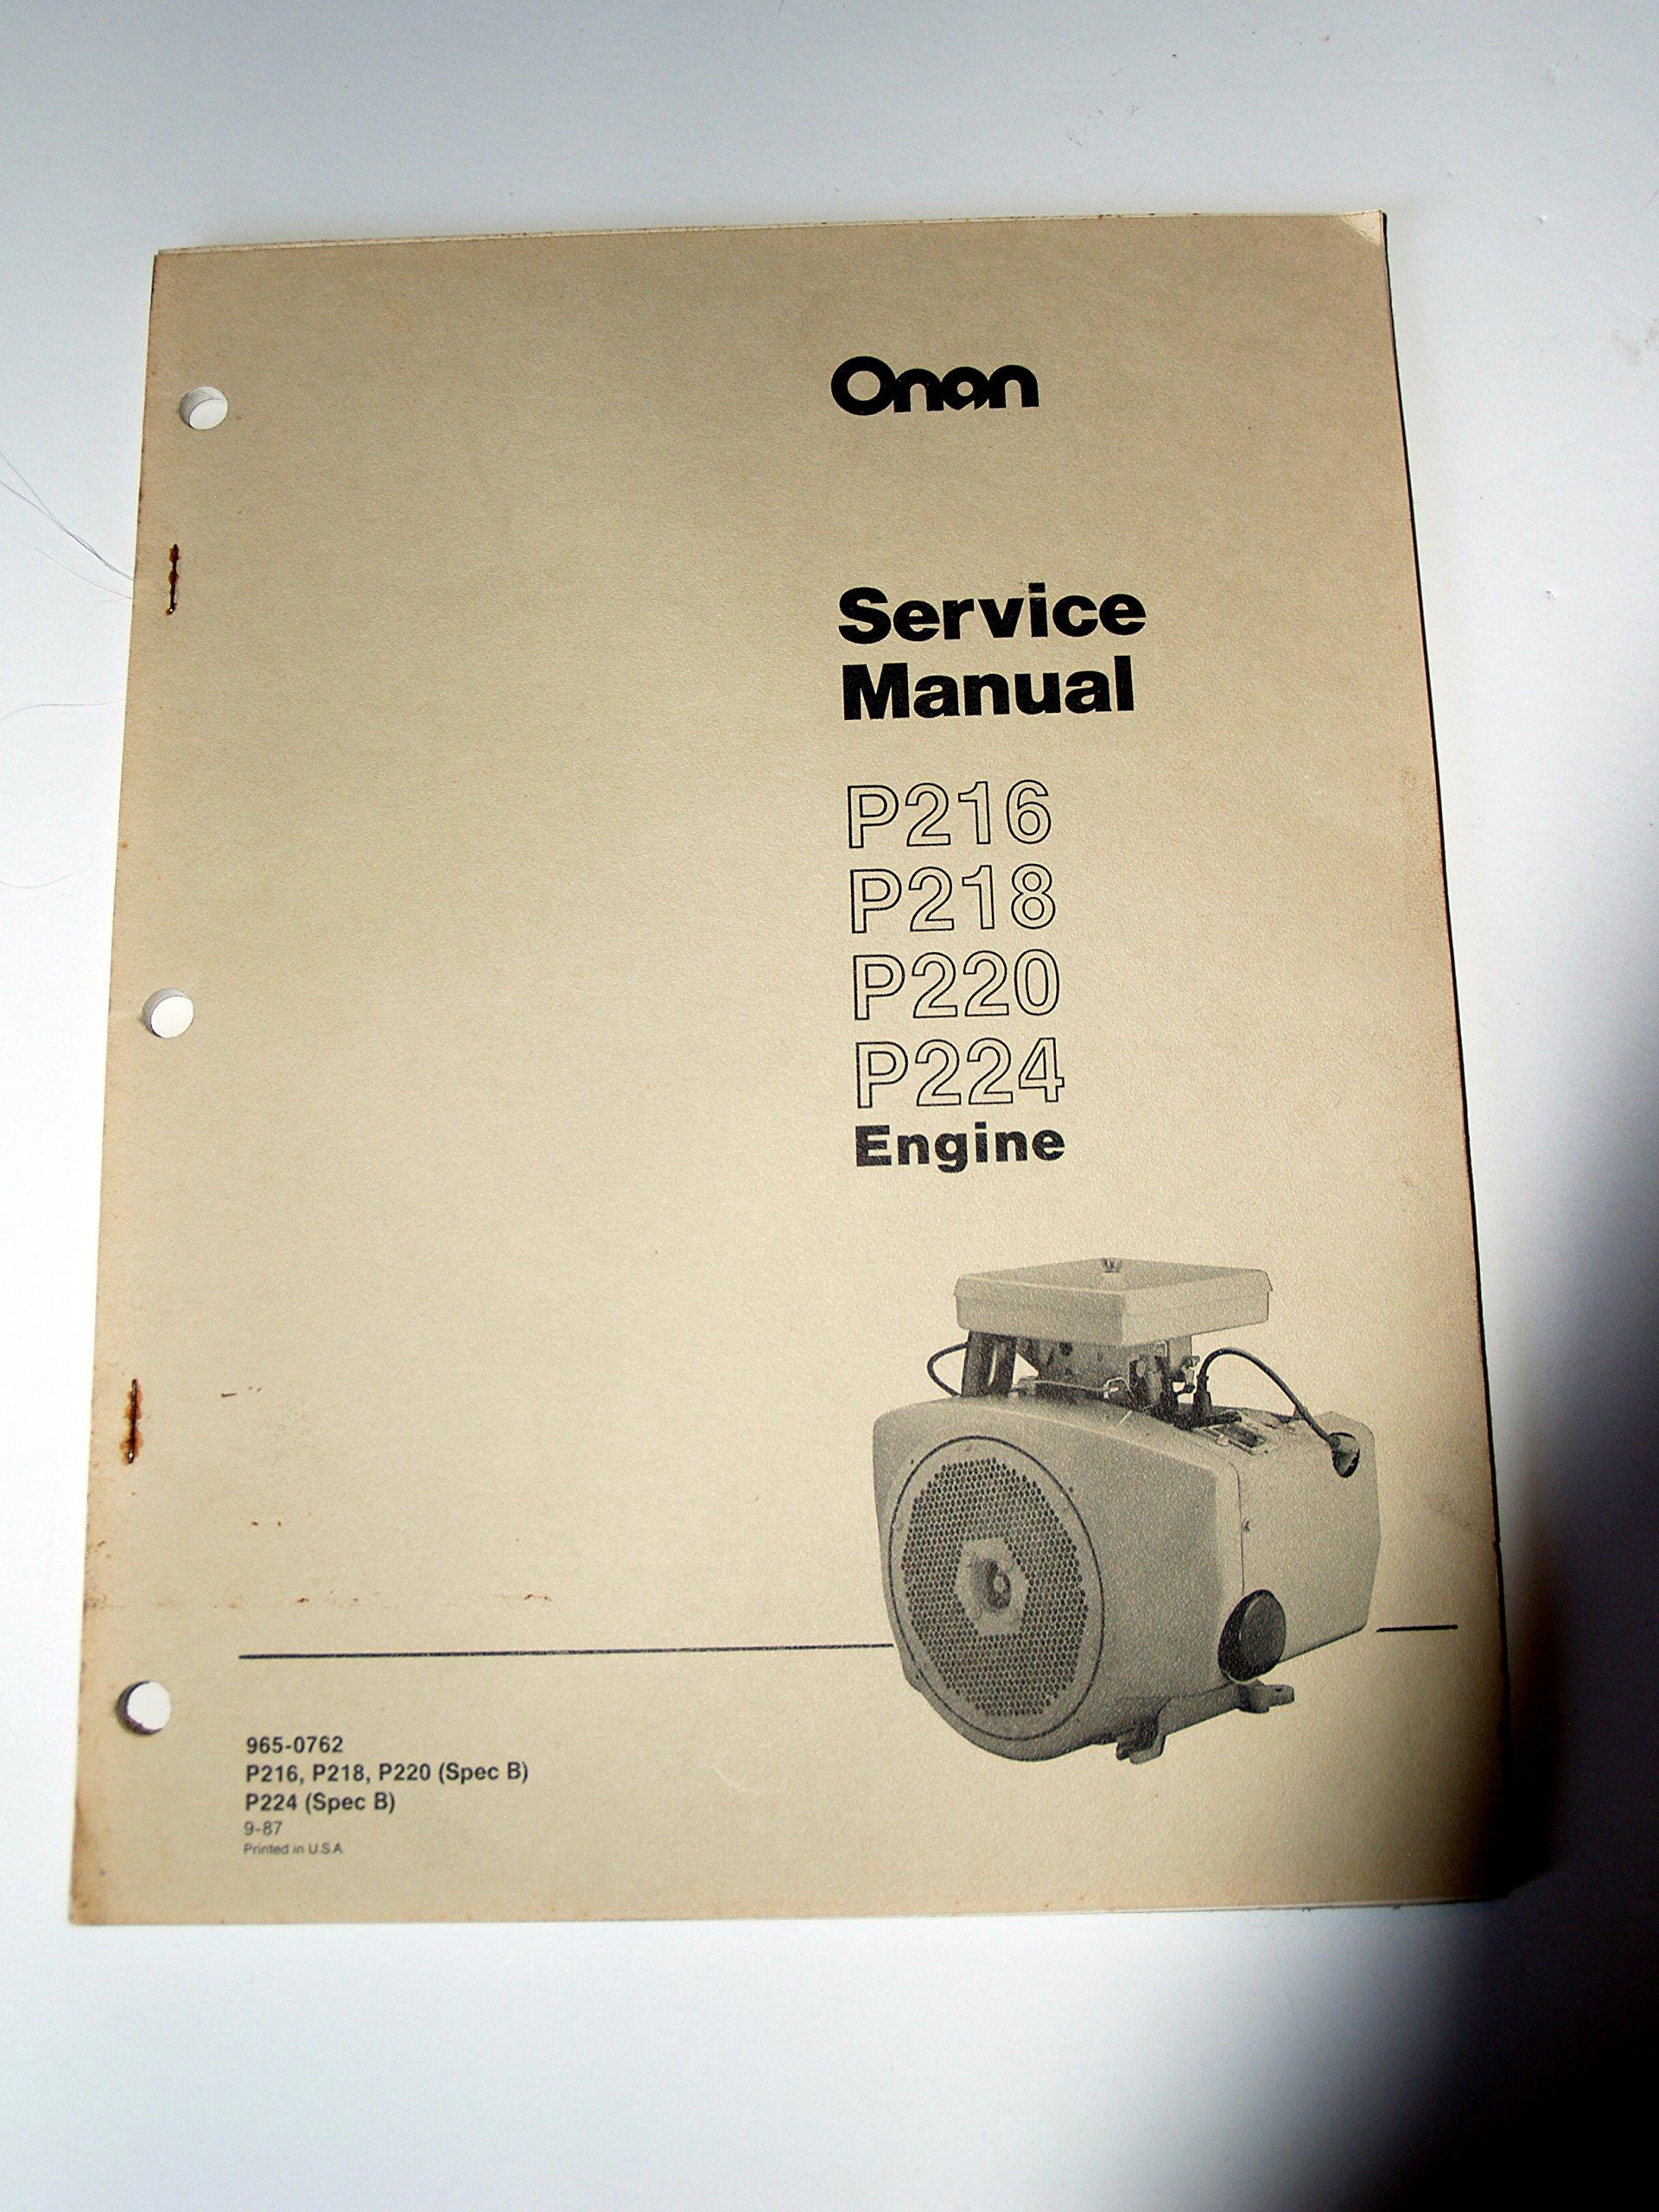 Onan P216 P218 P220 P224 Engine Service Manual: Onan: 0739718157620:  Amazon.com: Books